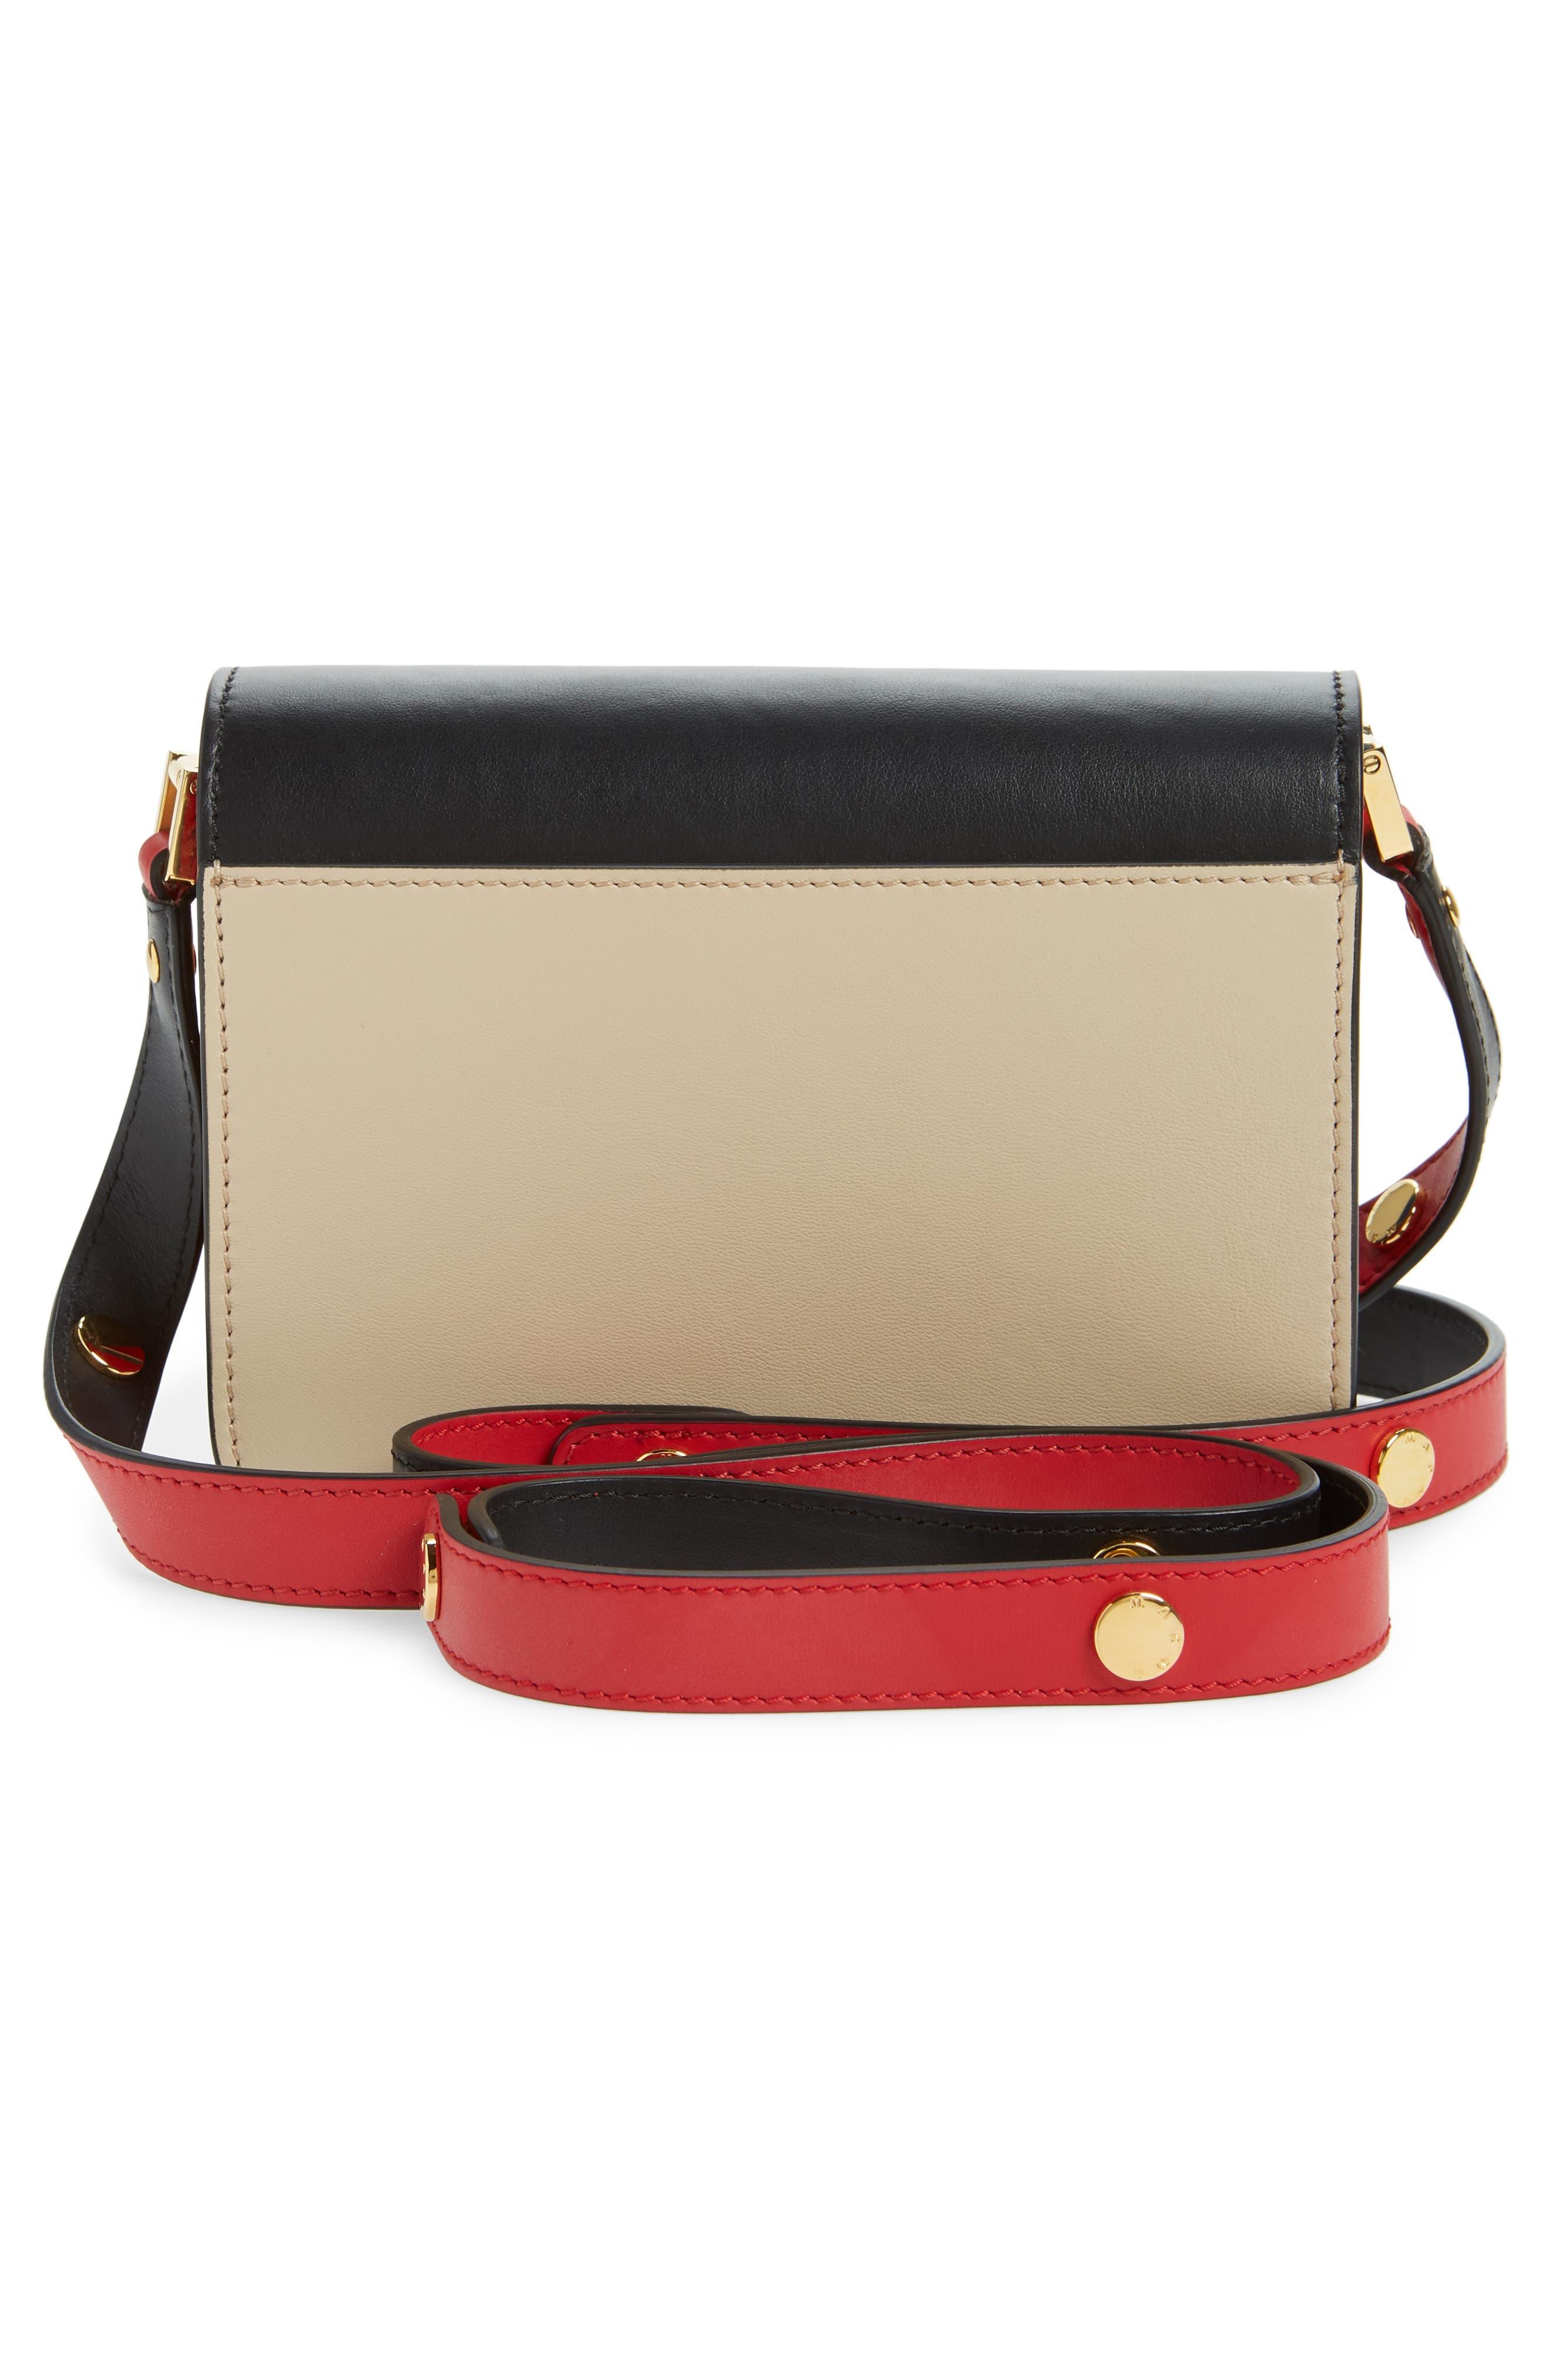 Small Trunk Colorblock Leather Shoulder Bag,                             Alternate thumbnail 3, color,                             LIGHT CAMEL/ BLACK/ RED